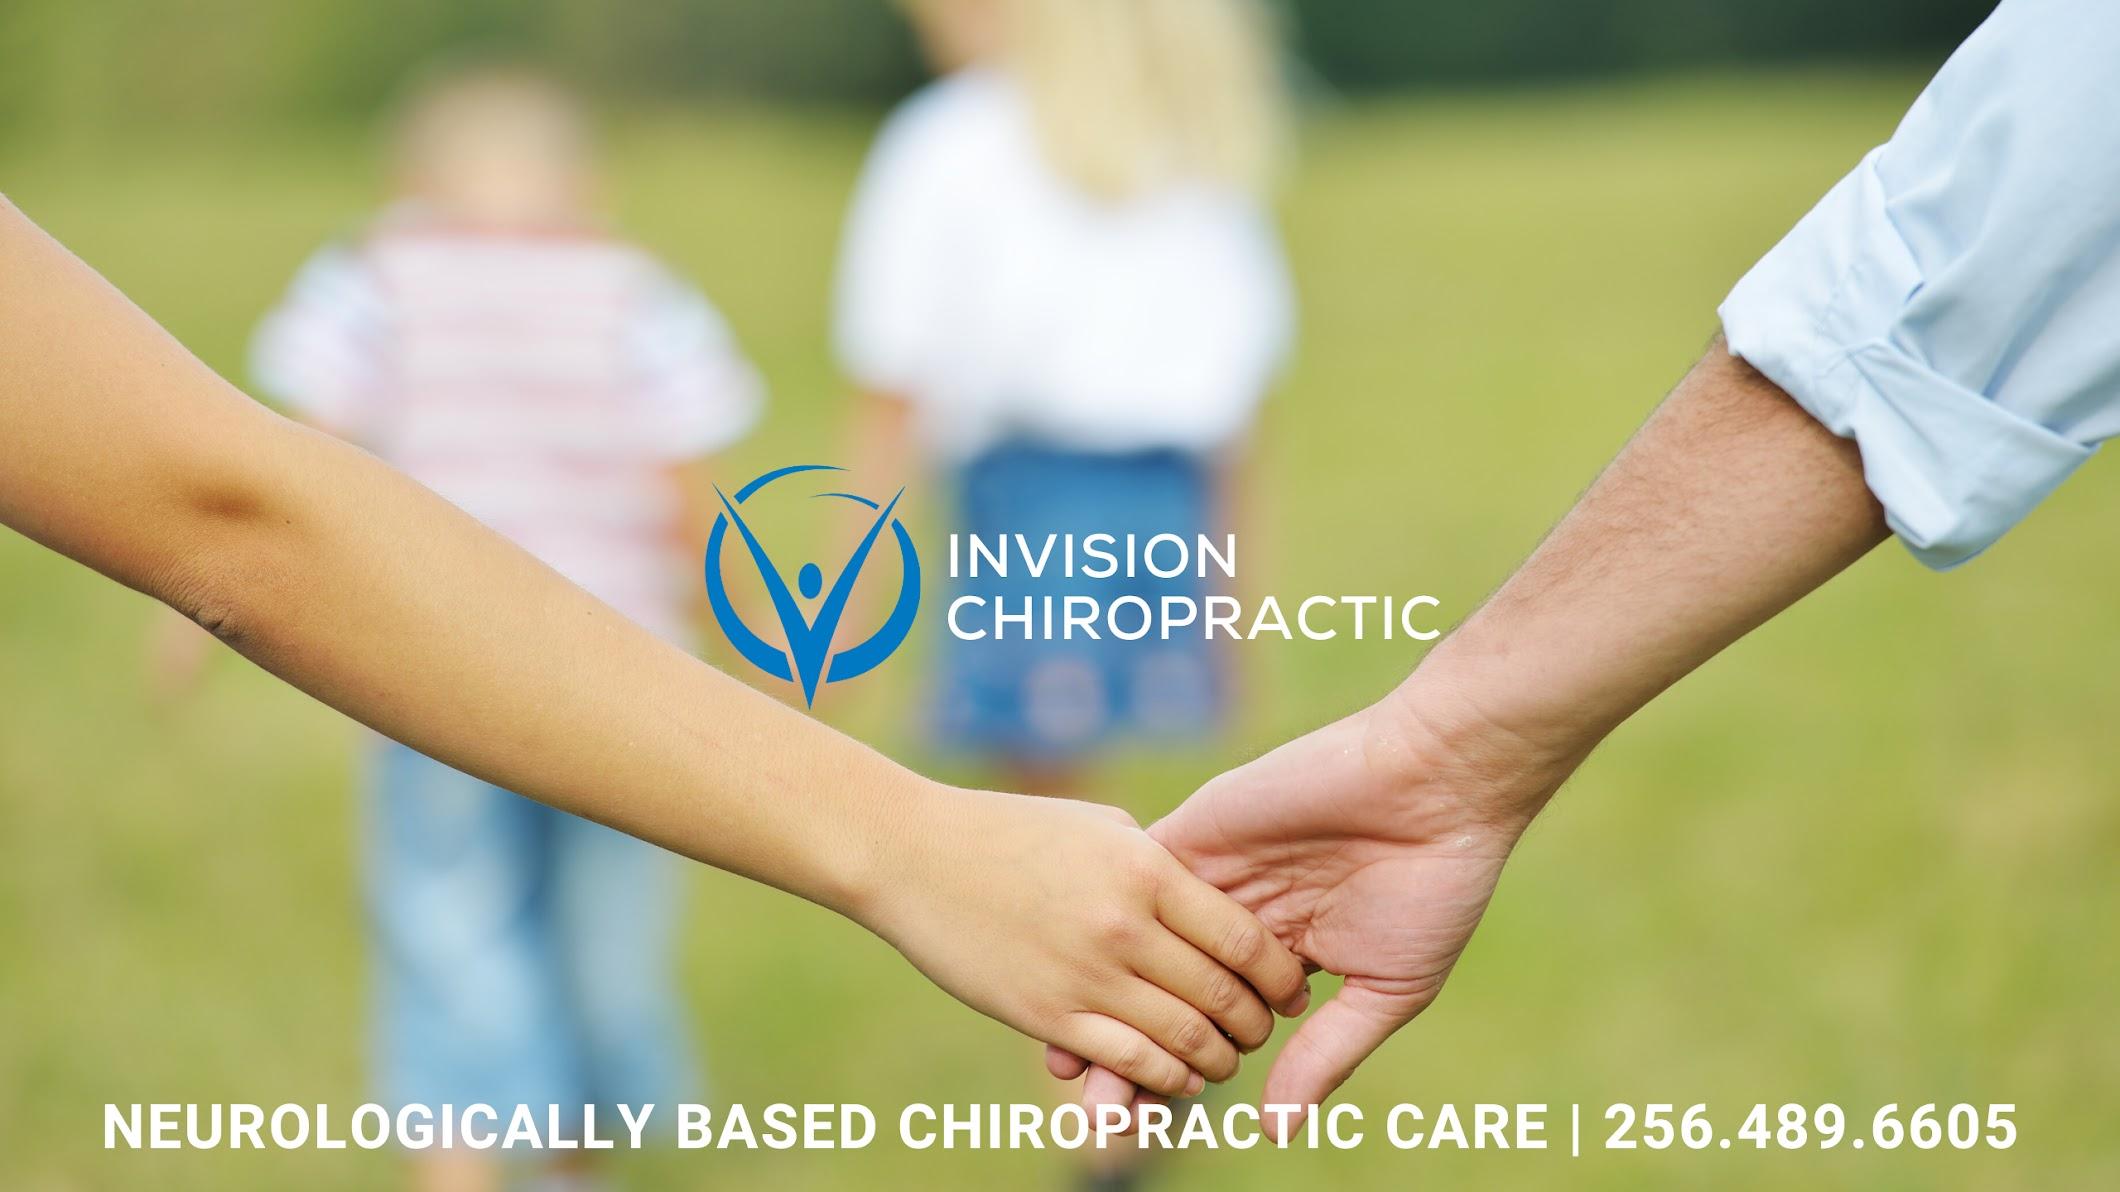 InVision Chiropractic